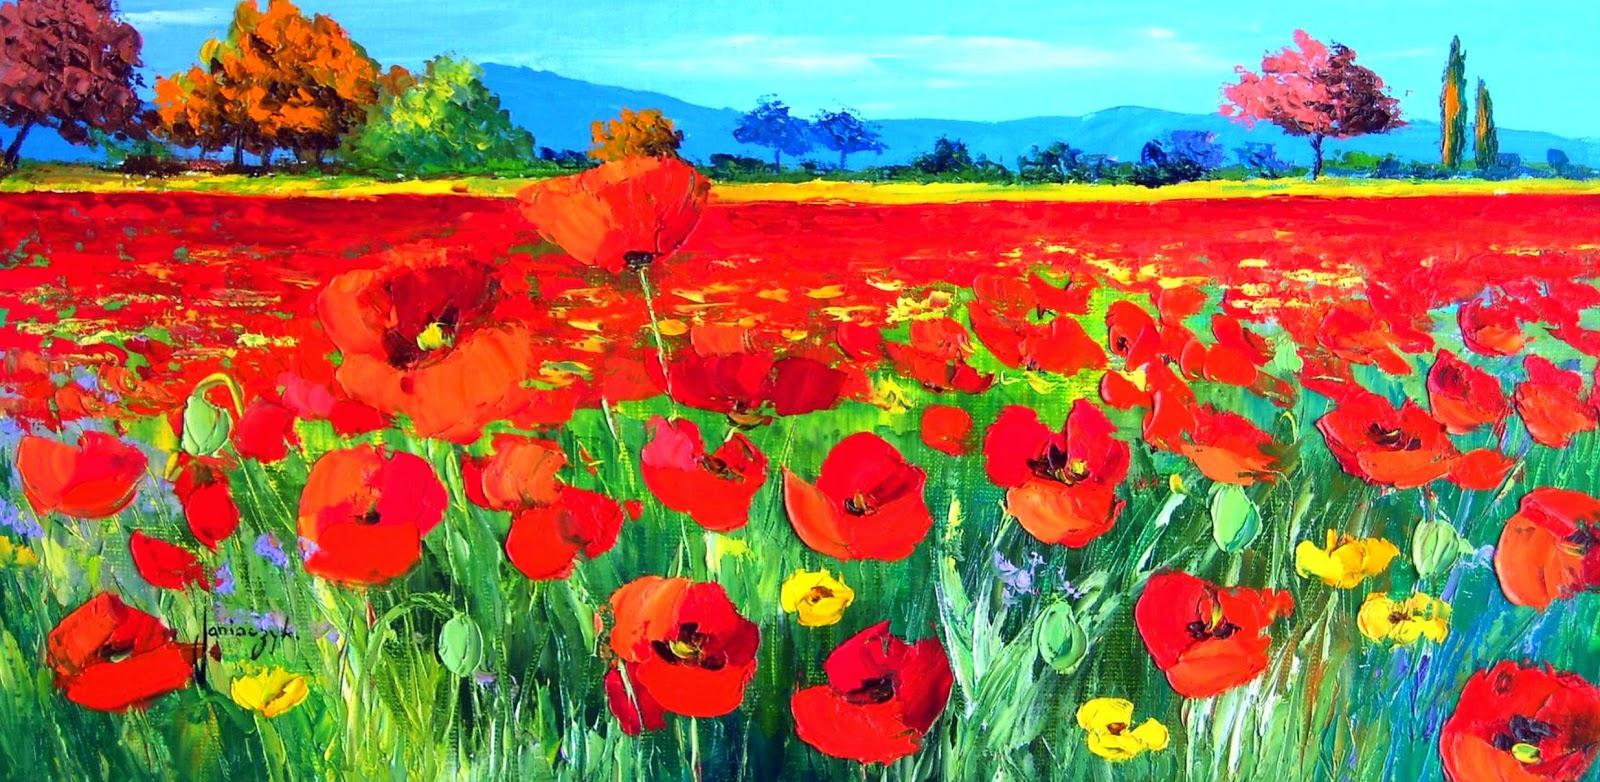 flores-en-paisajes-pintados-con-espatula